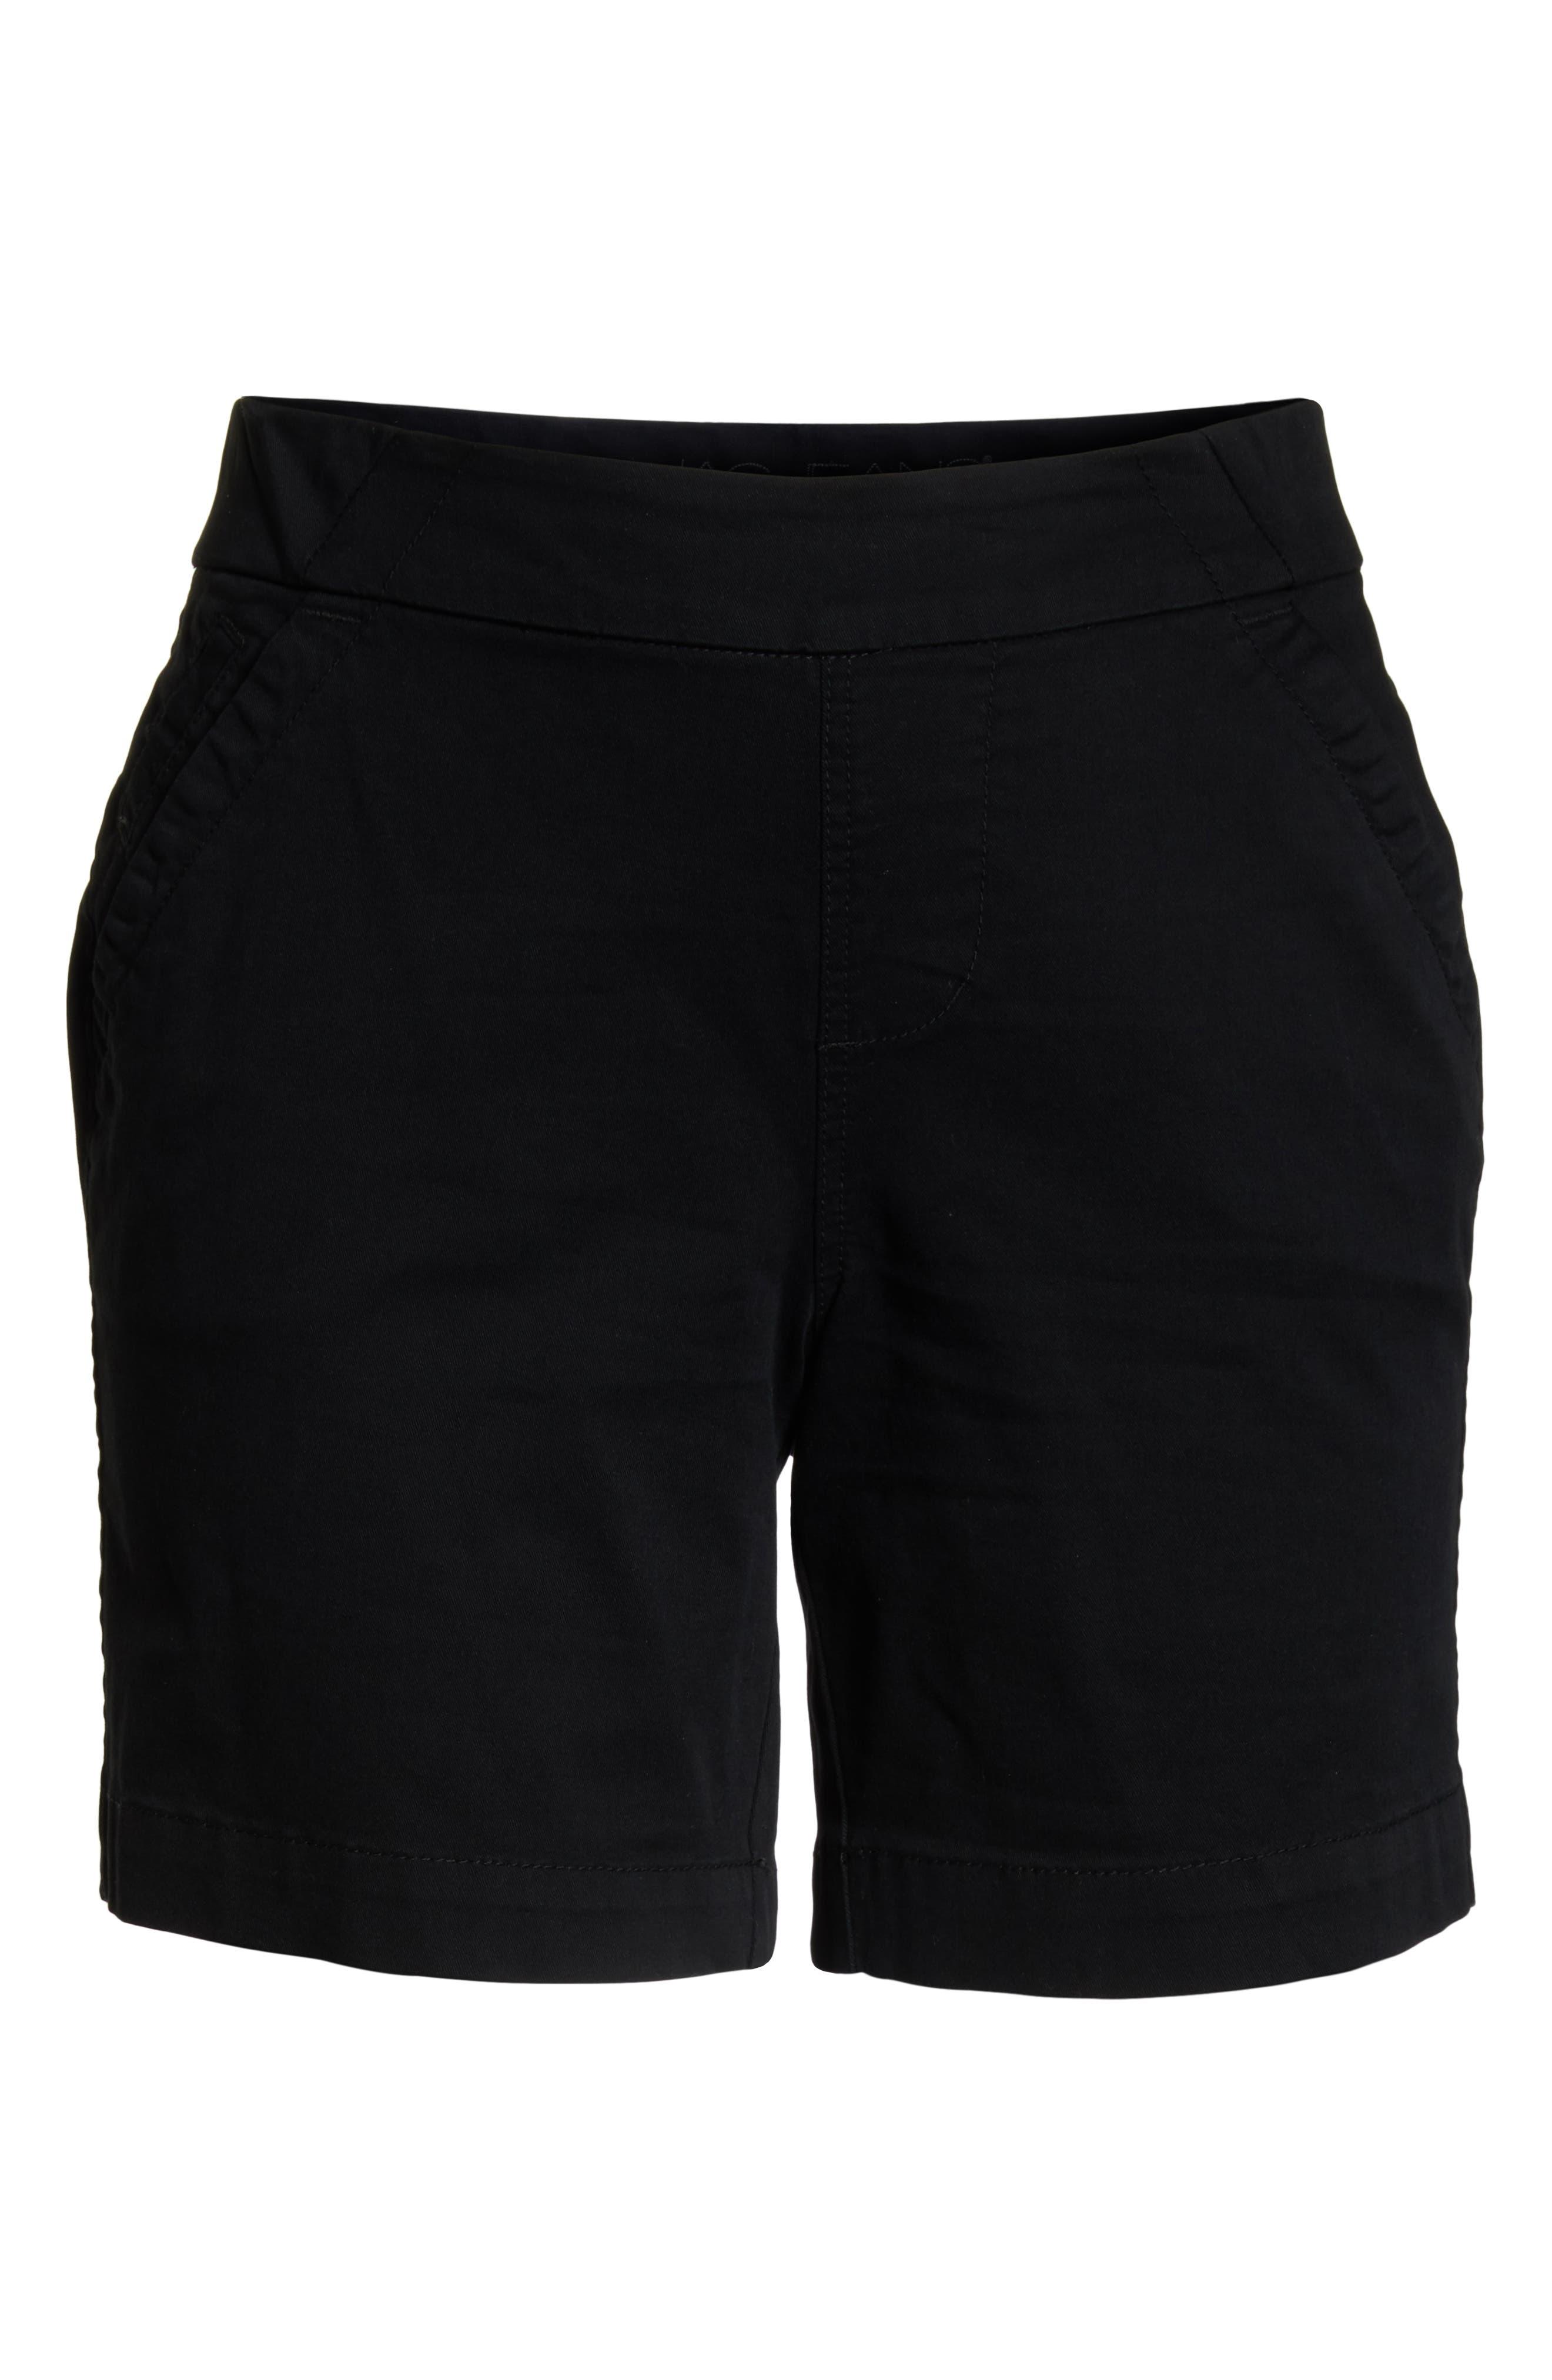 Gracie Stretch Cotton Shorts,                             Alternate thumbnail 6, color,                             BLACK